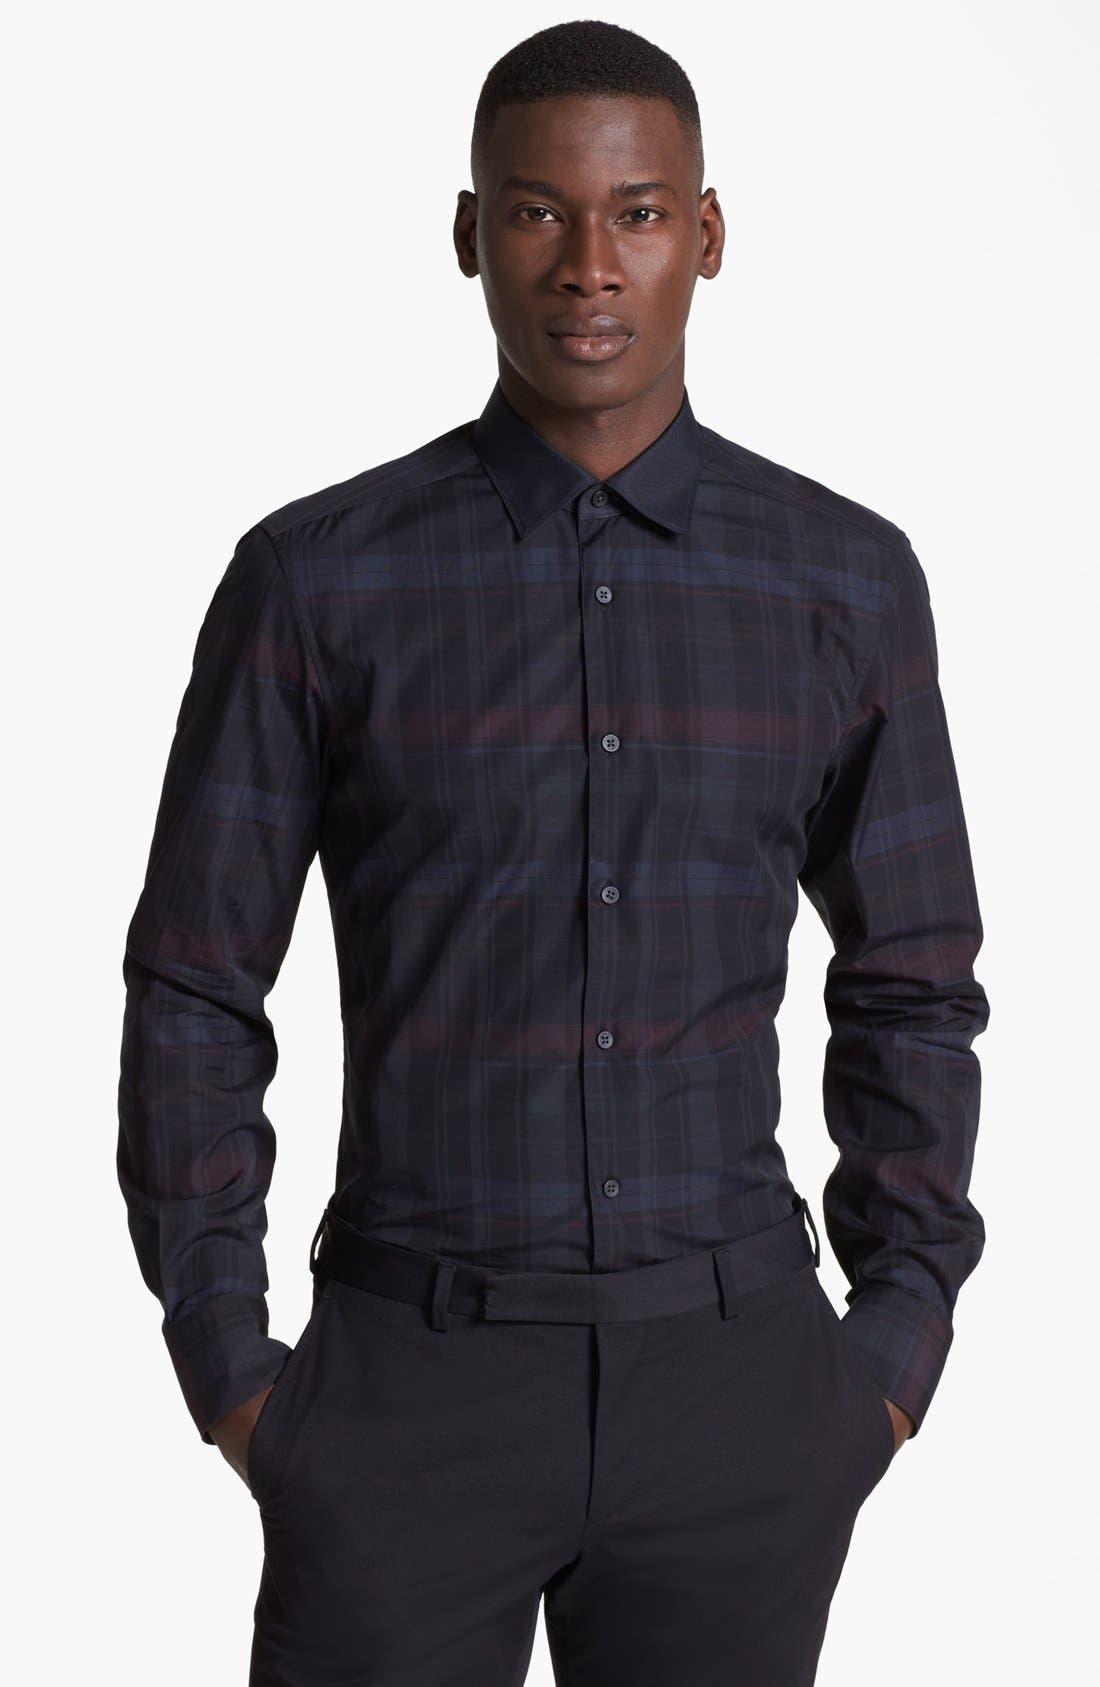 Main Image - Z Zegna Plaid Check Woven Shirt